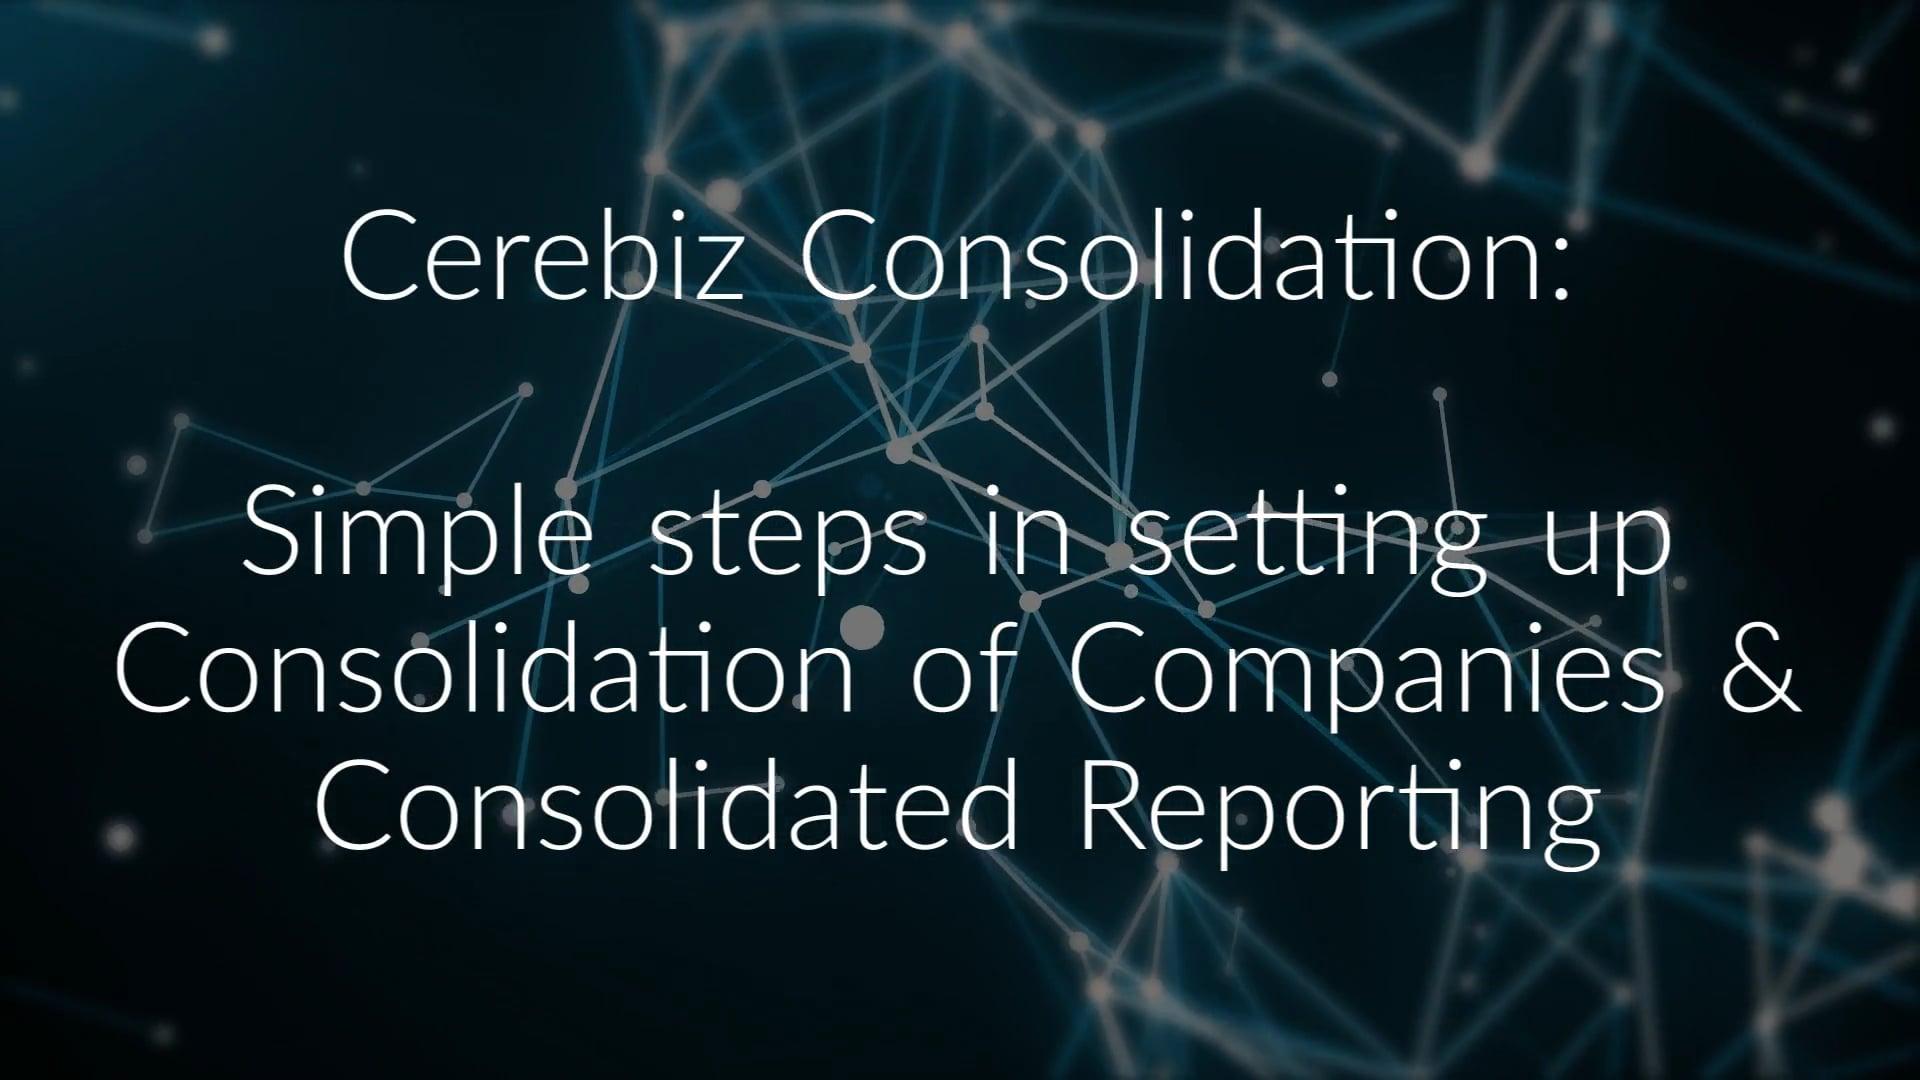 Cerebiz Consolidation